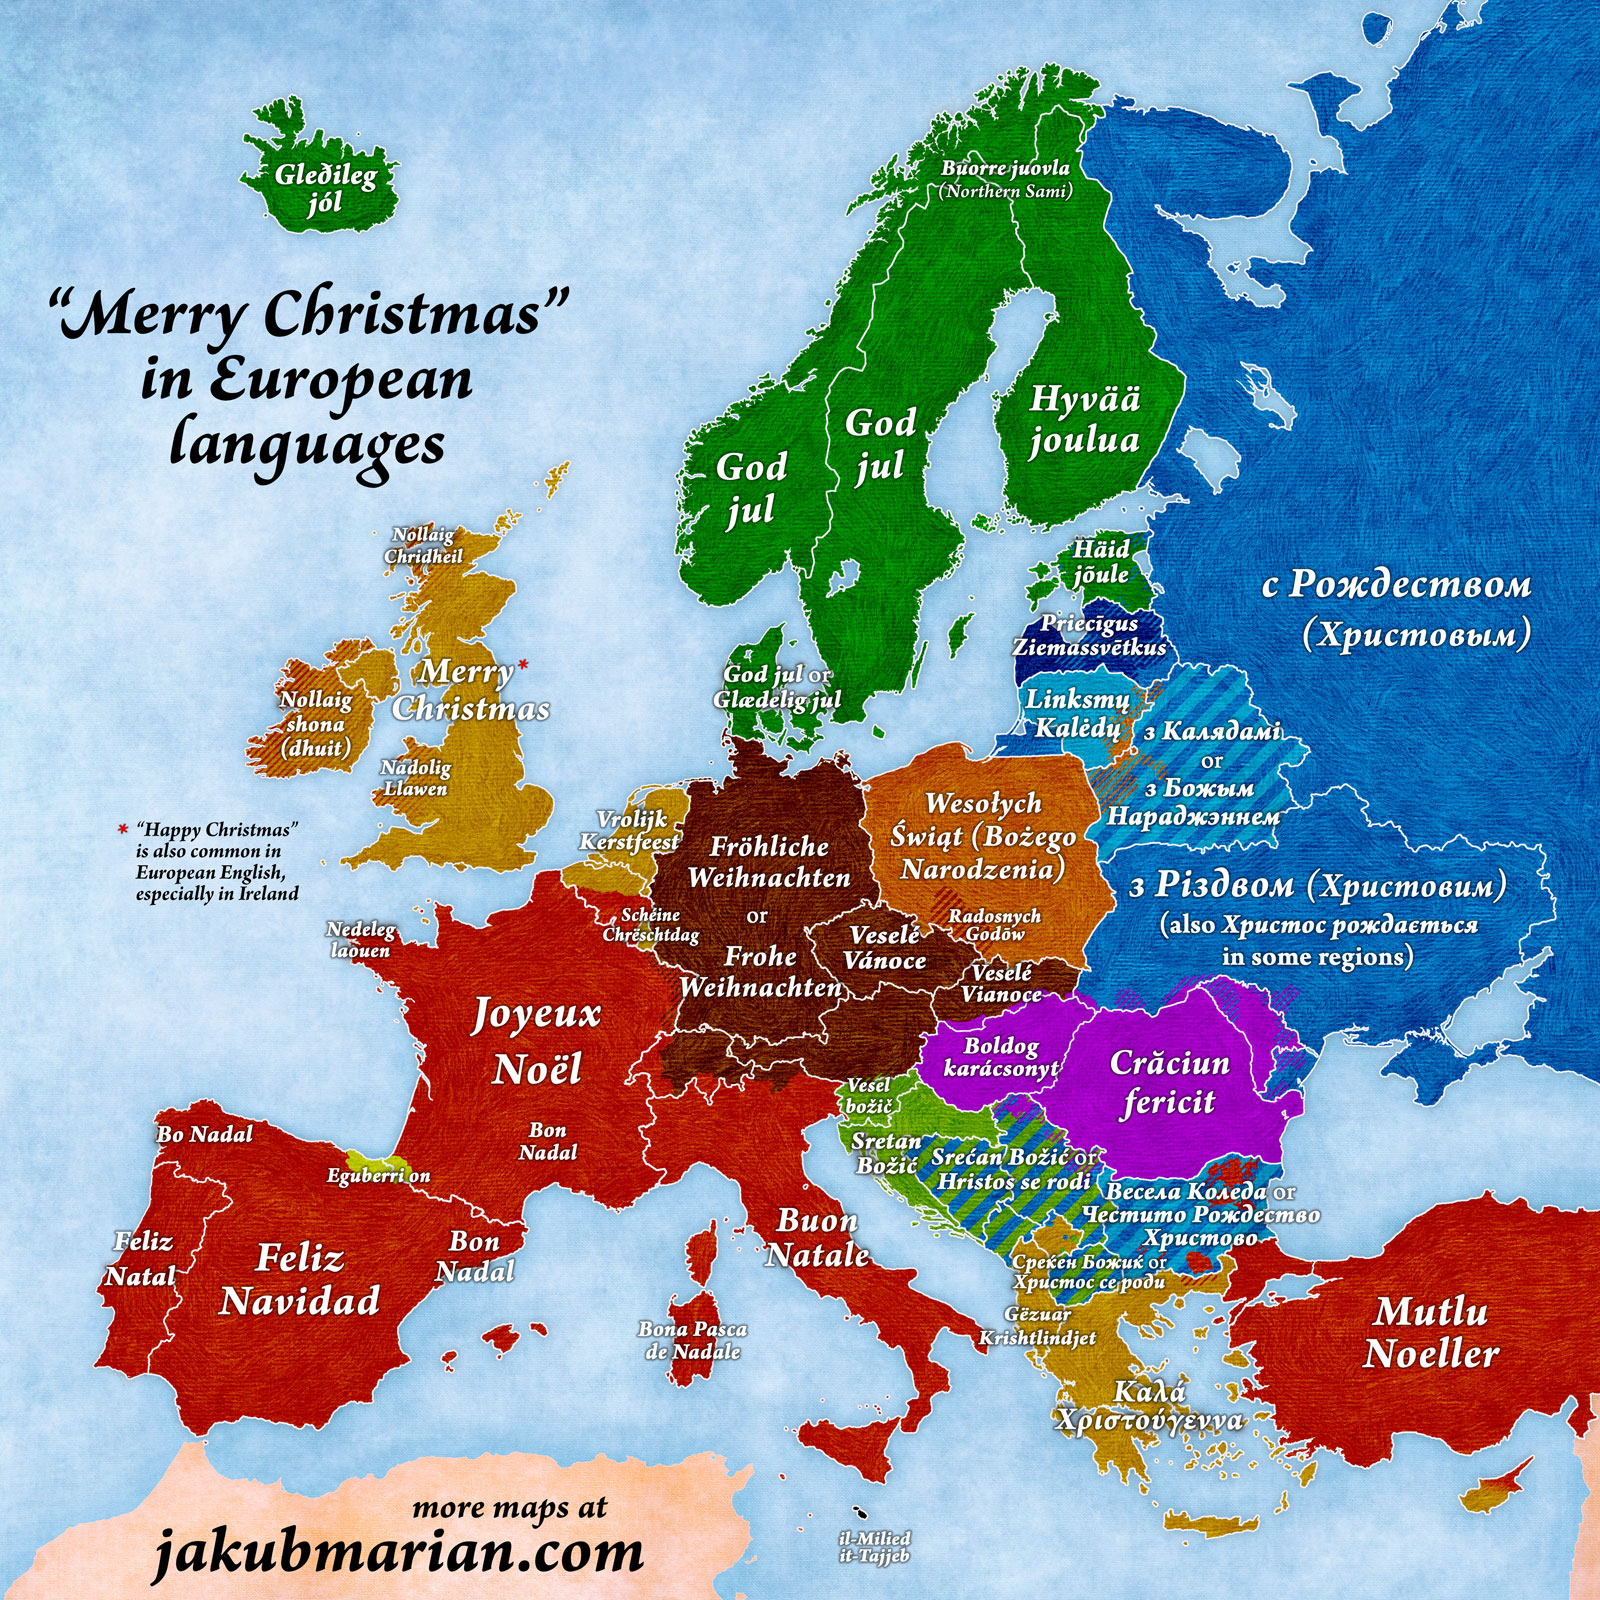 merry-christmas-european-languages